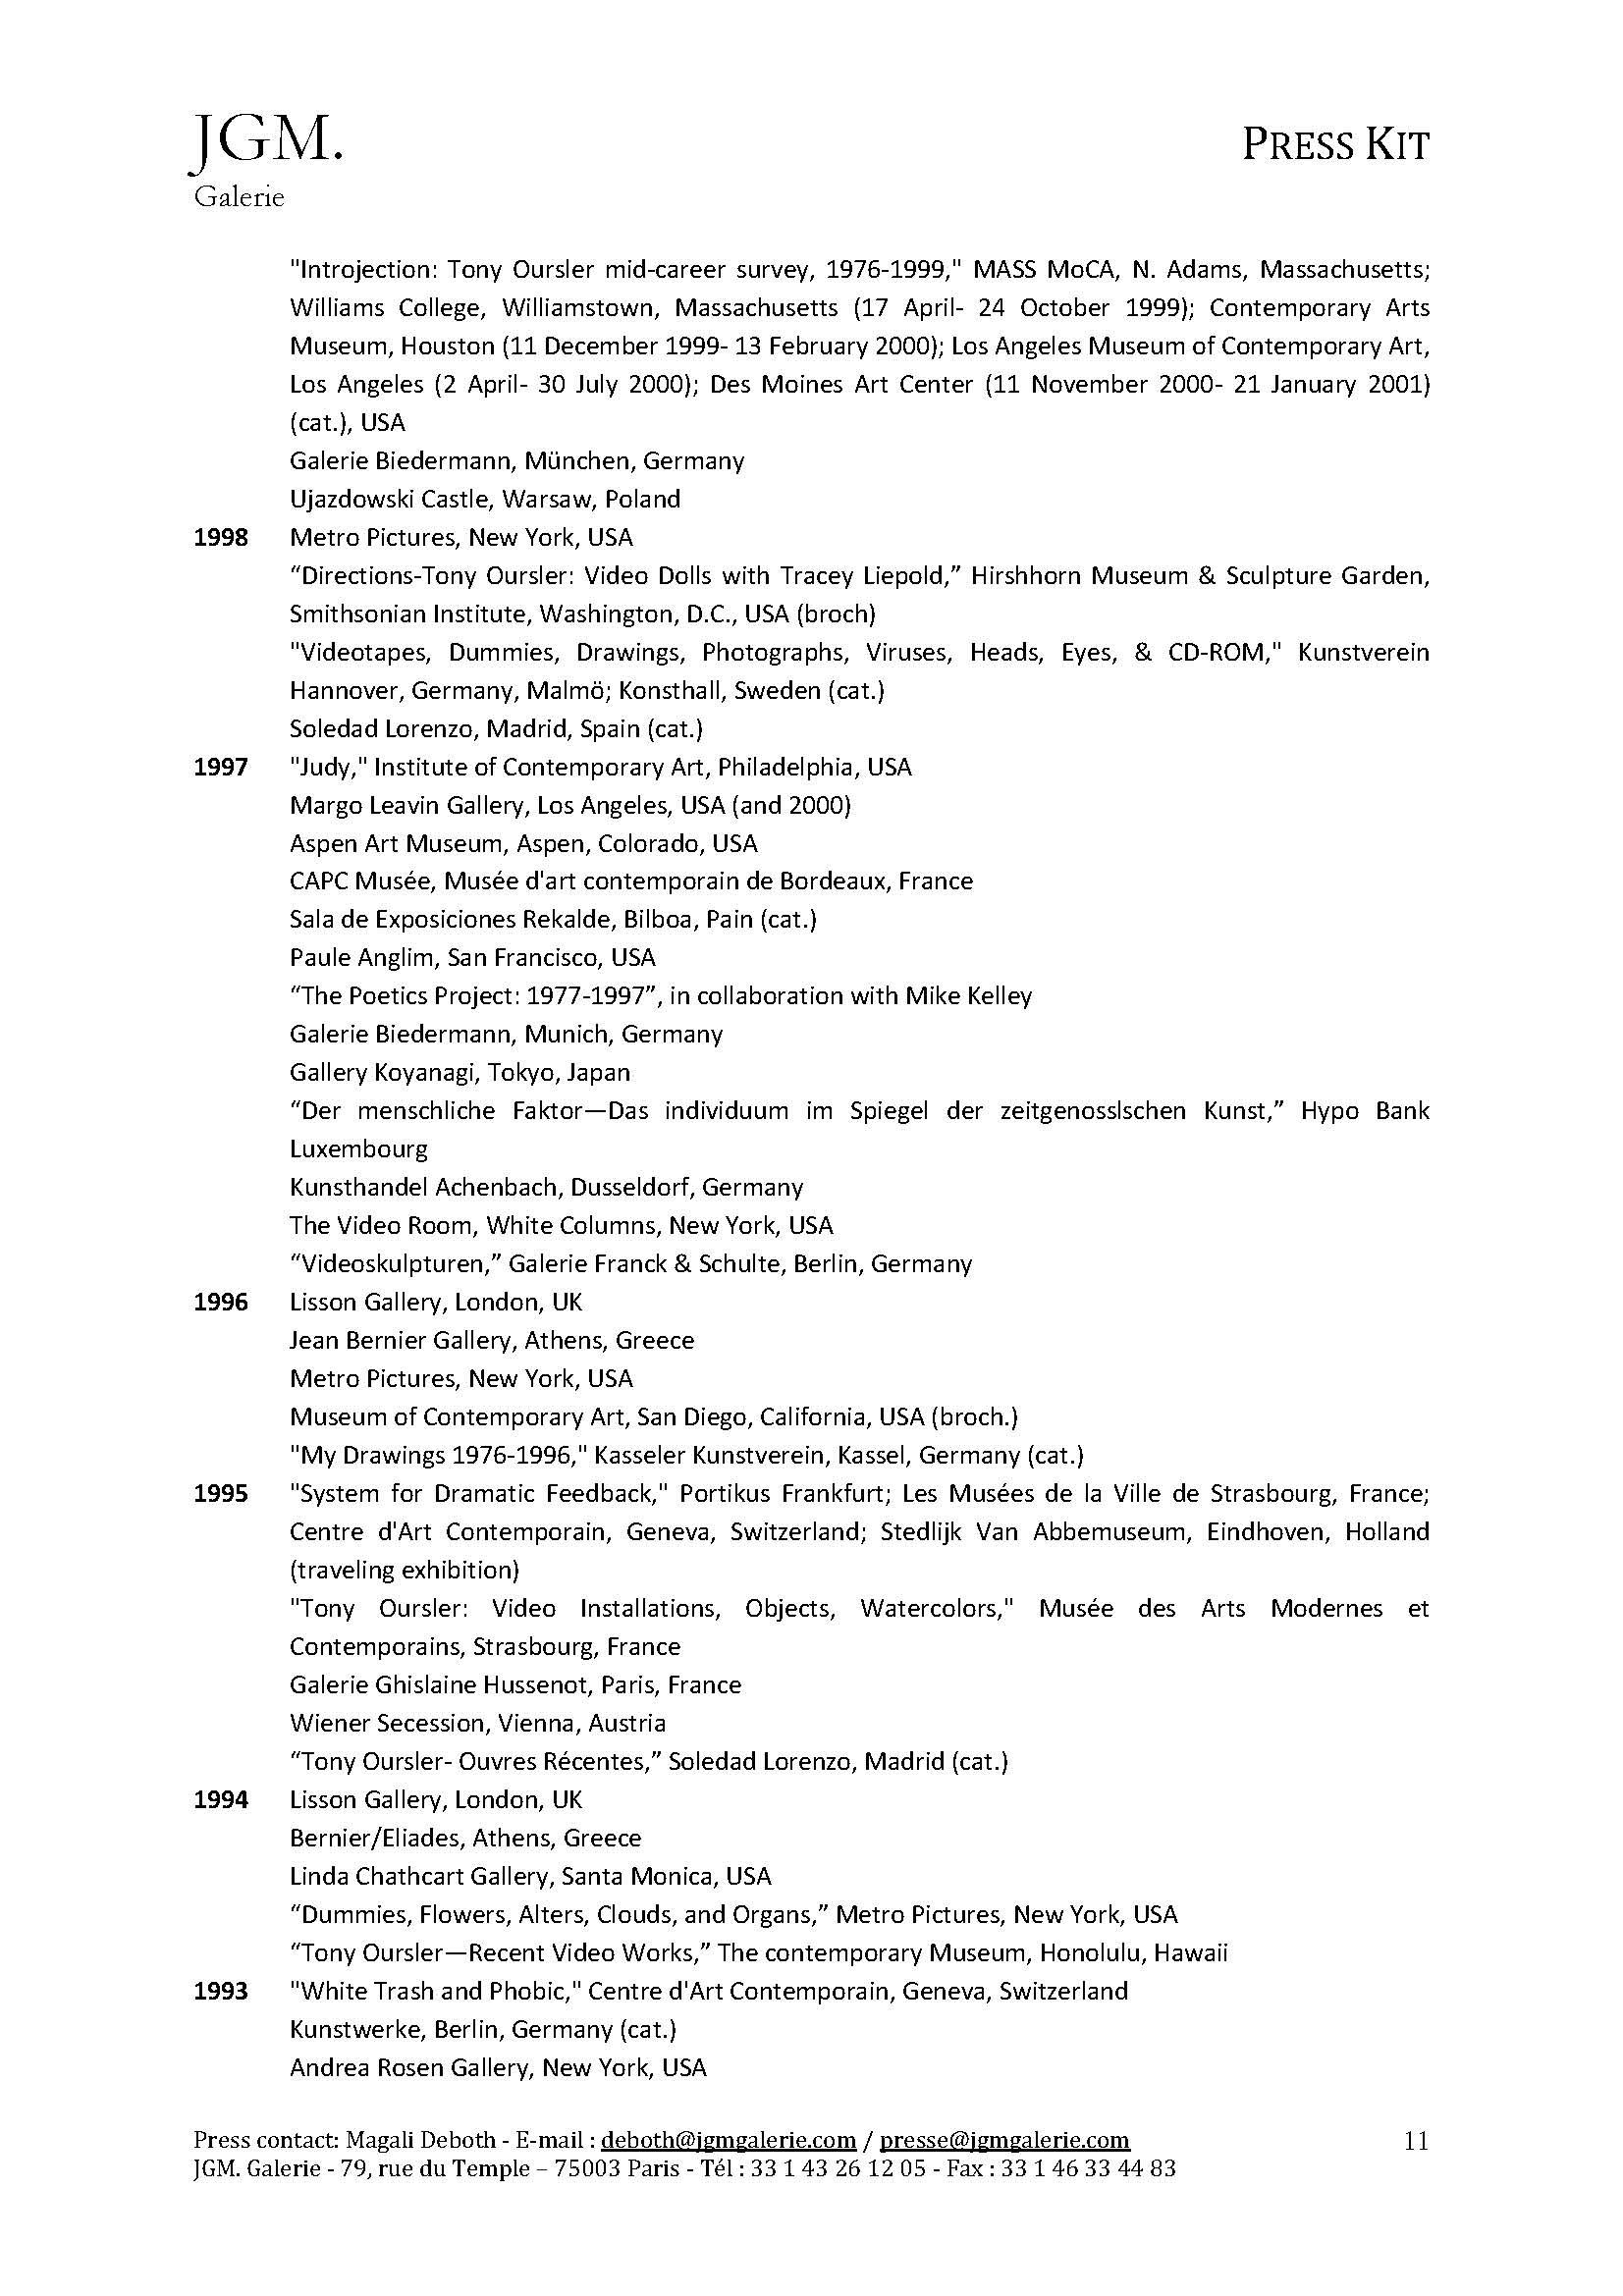 PRESS KIT OURSLER EN_Page_11.jpg